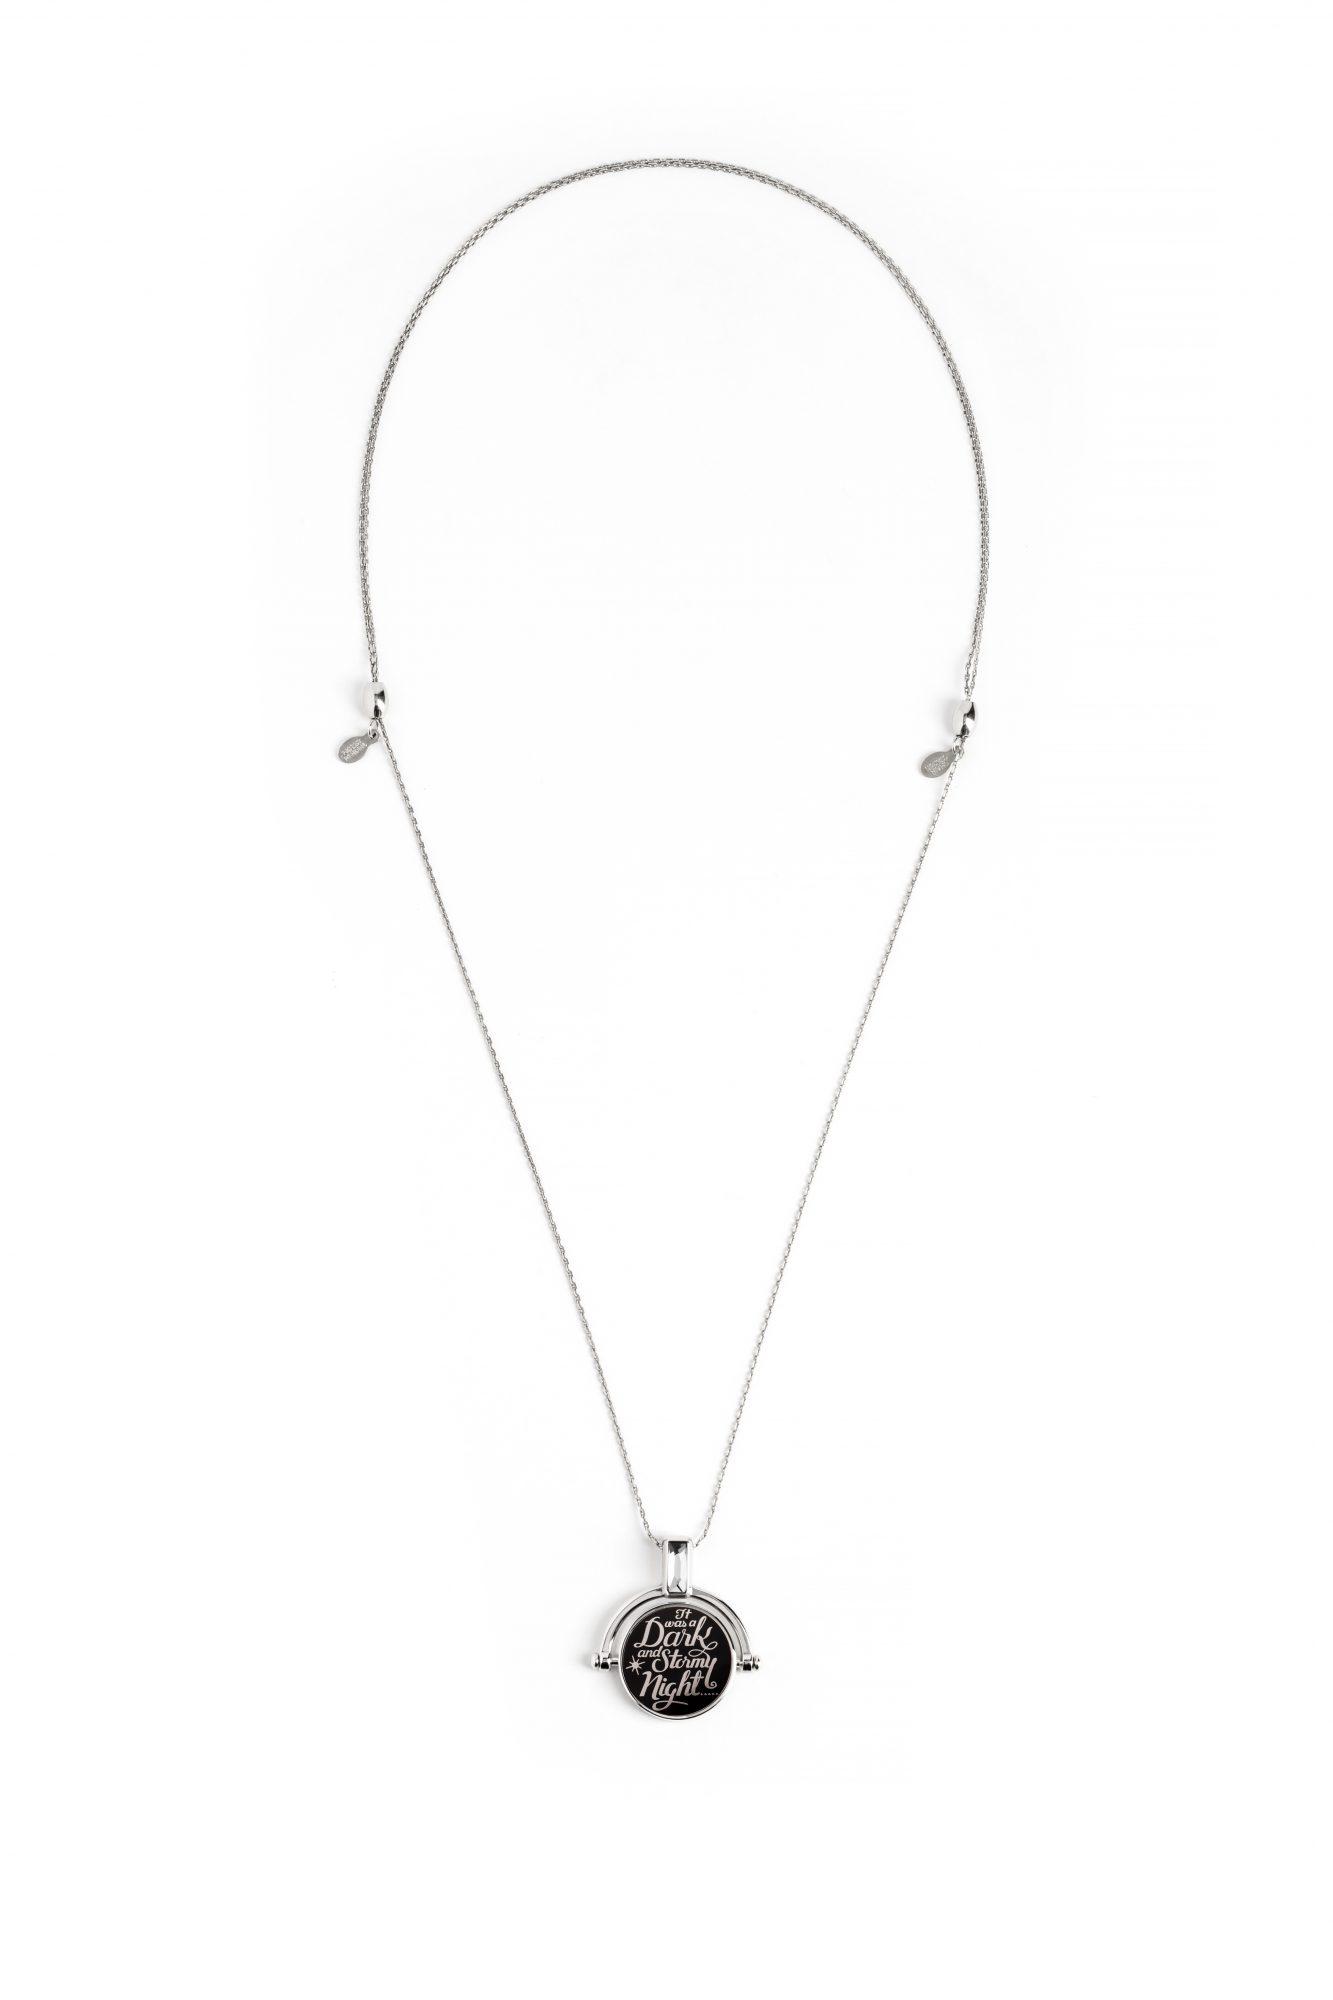 awit-dark-story-necklace.jpg